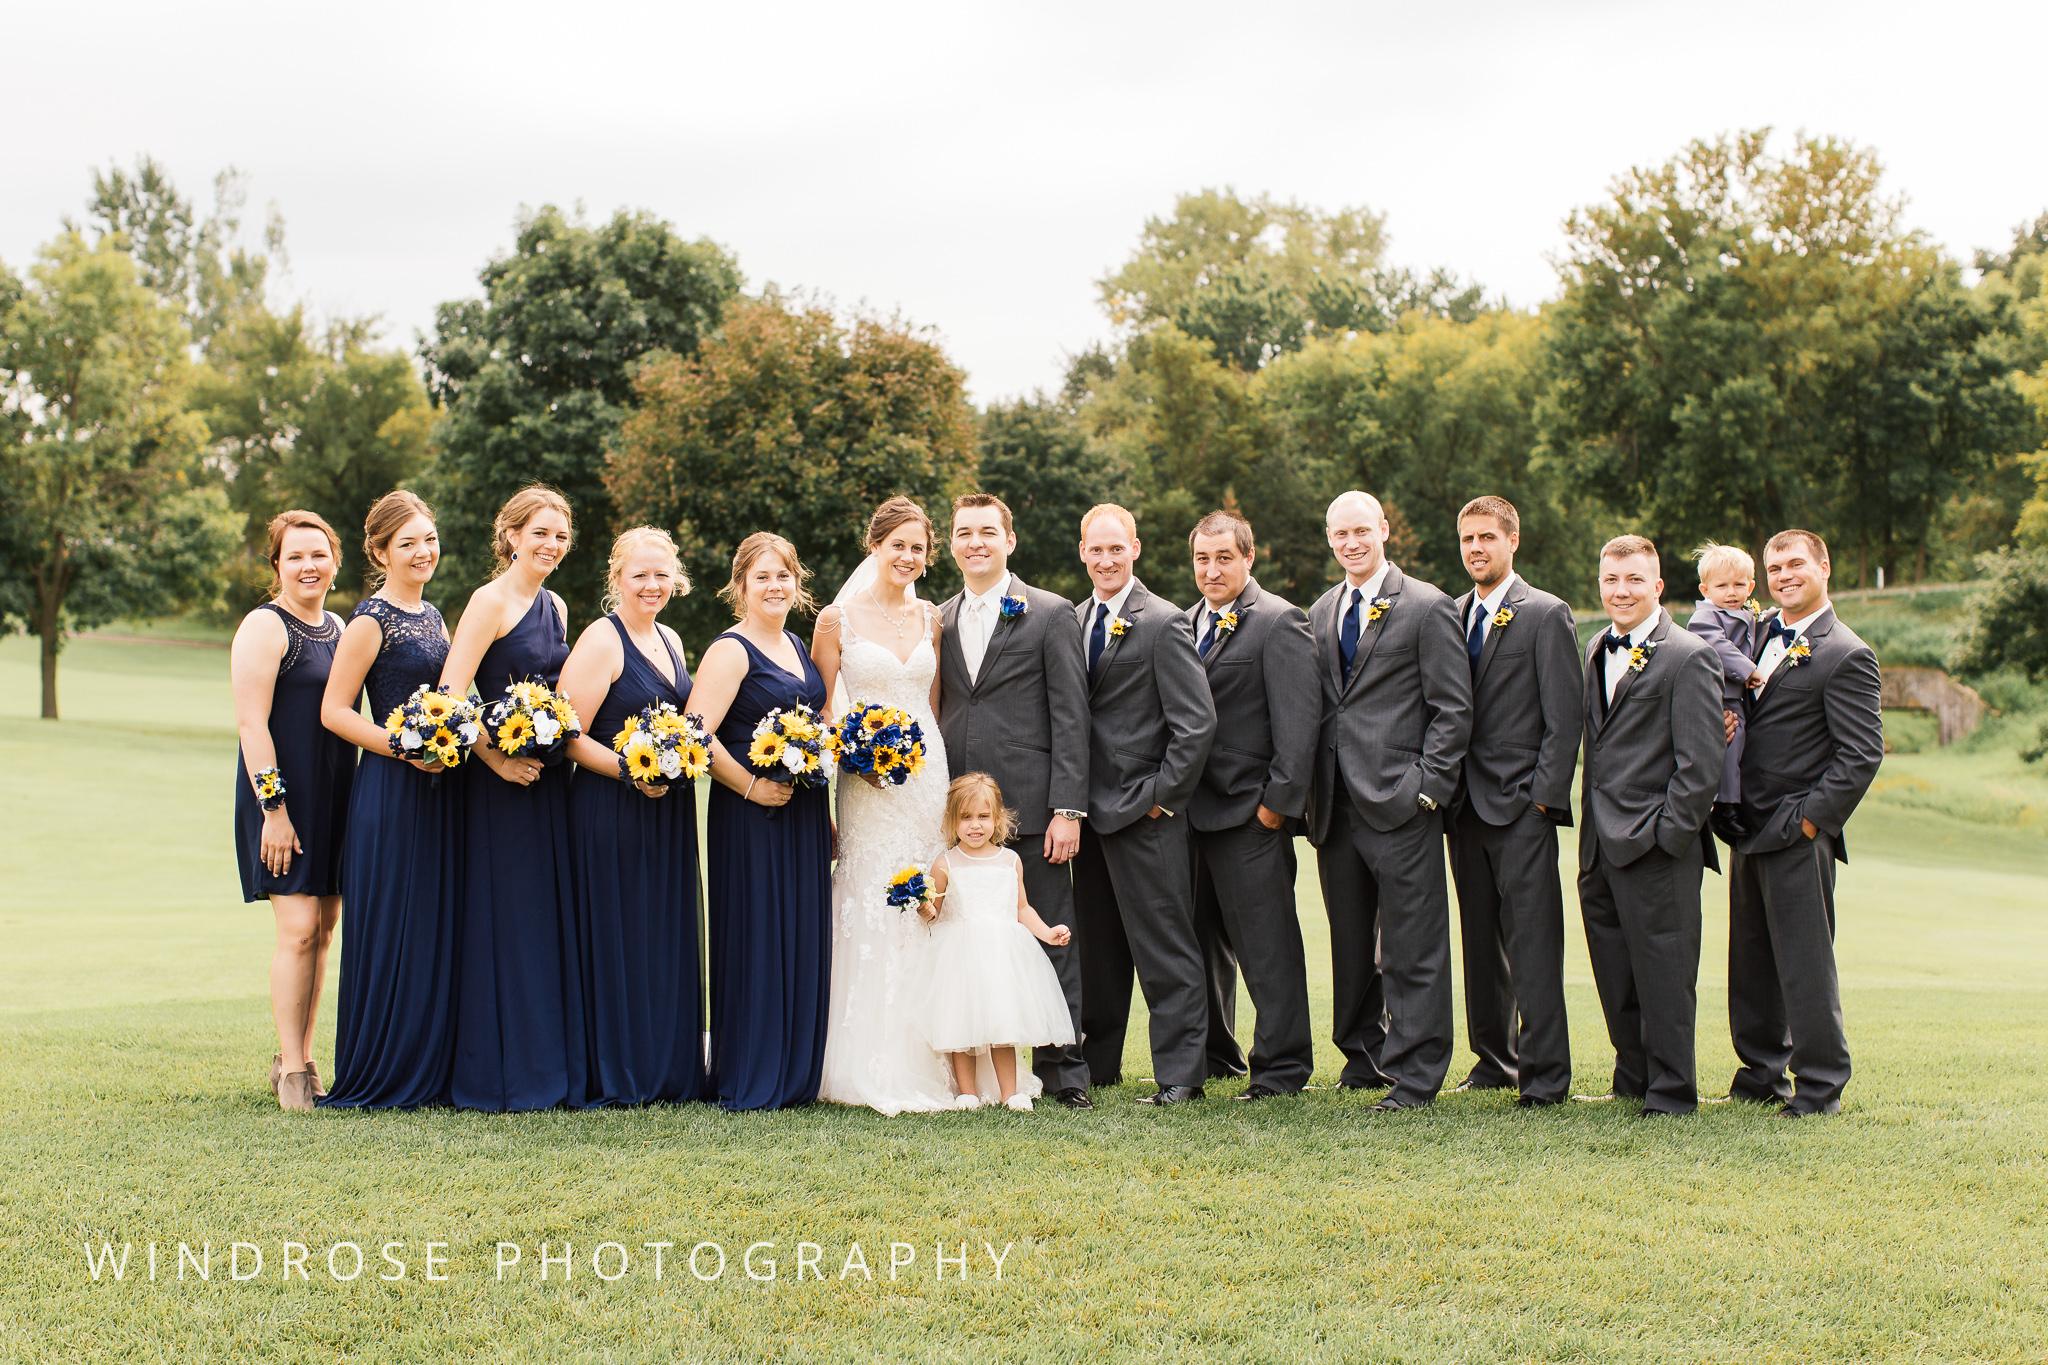 La-Crosse-Country-Club-Wedding-Minnesota-Wedding-Photographer-17.jpg